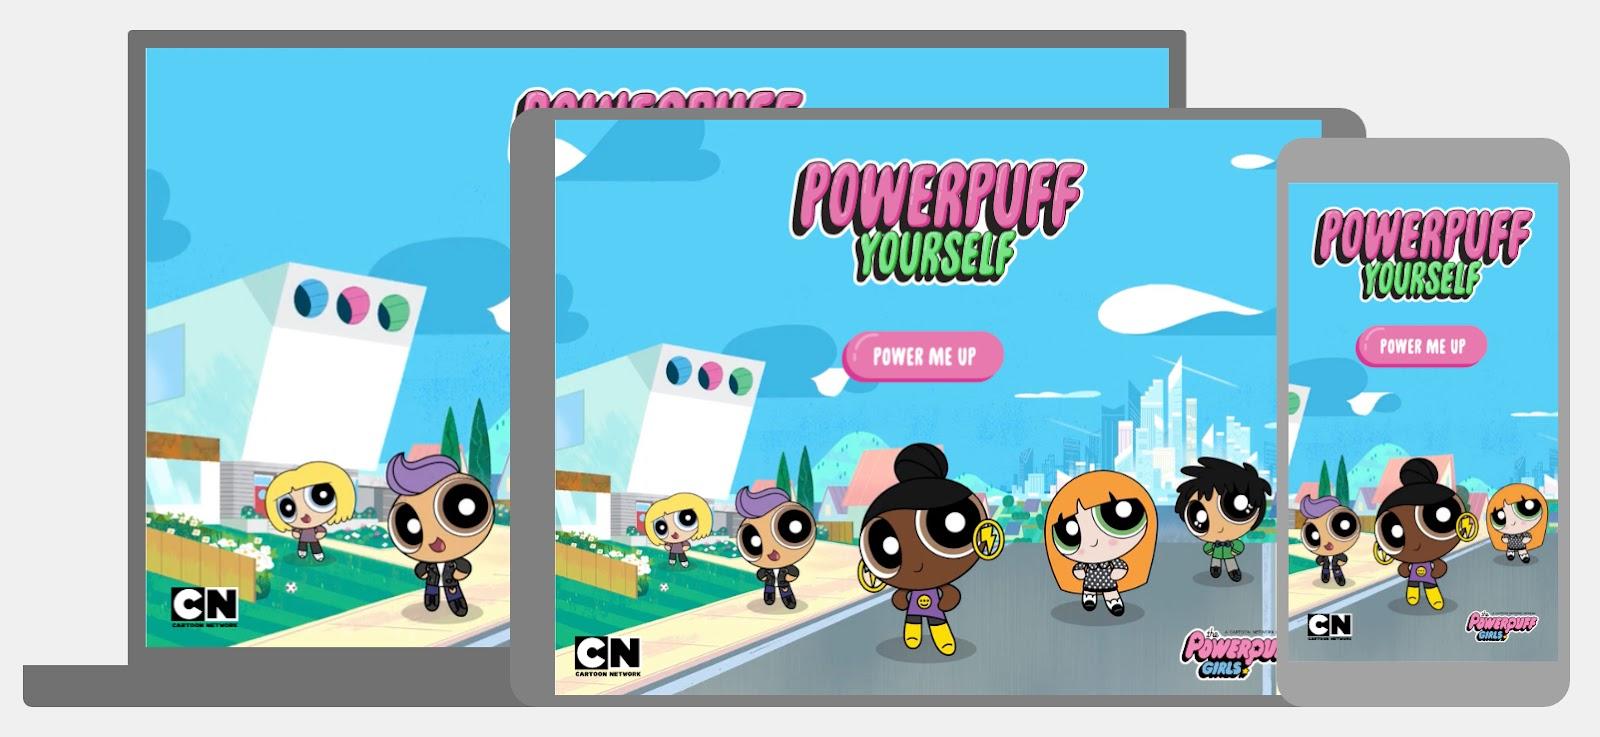 Powerpuff Yourself homepage